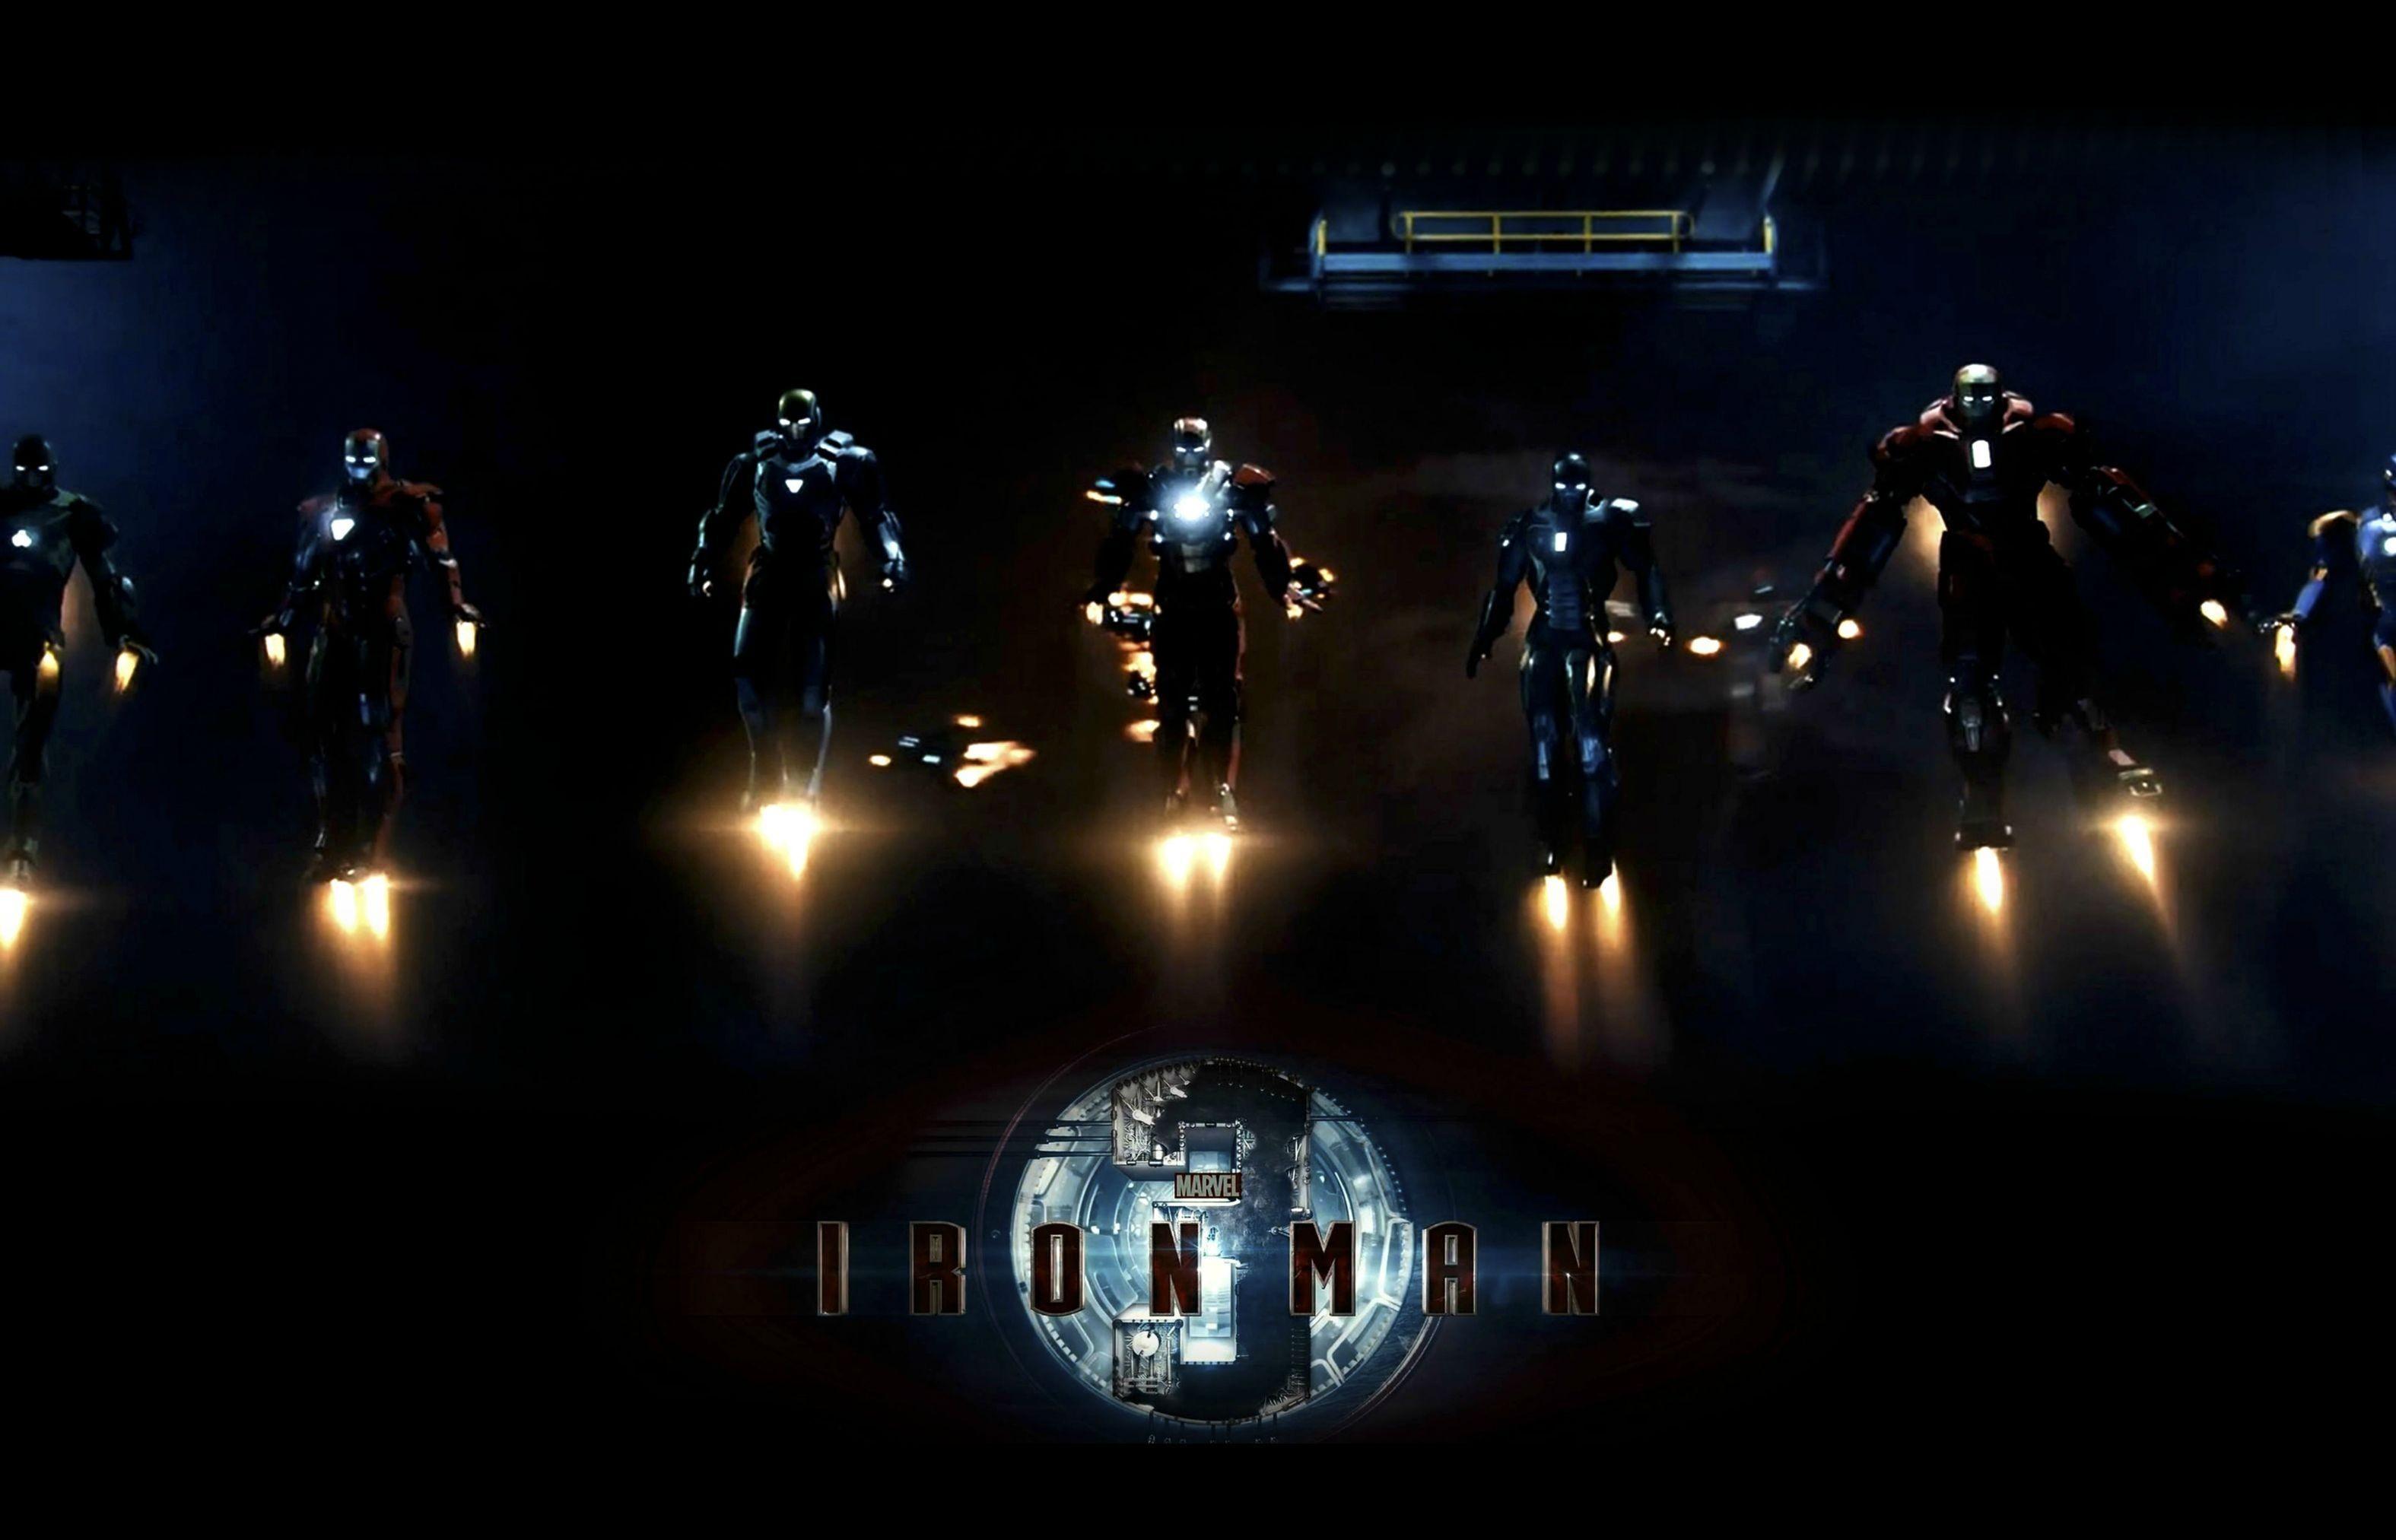 HD Wallpapers Iron Man 3 – Wallpaper Cave